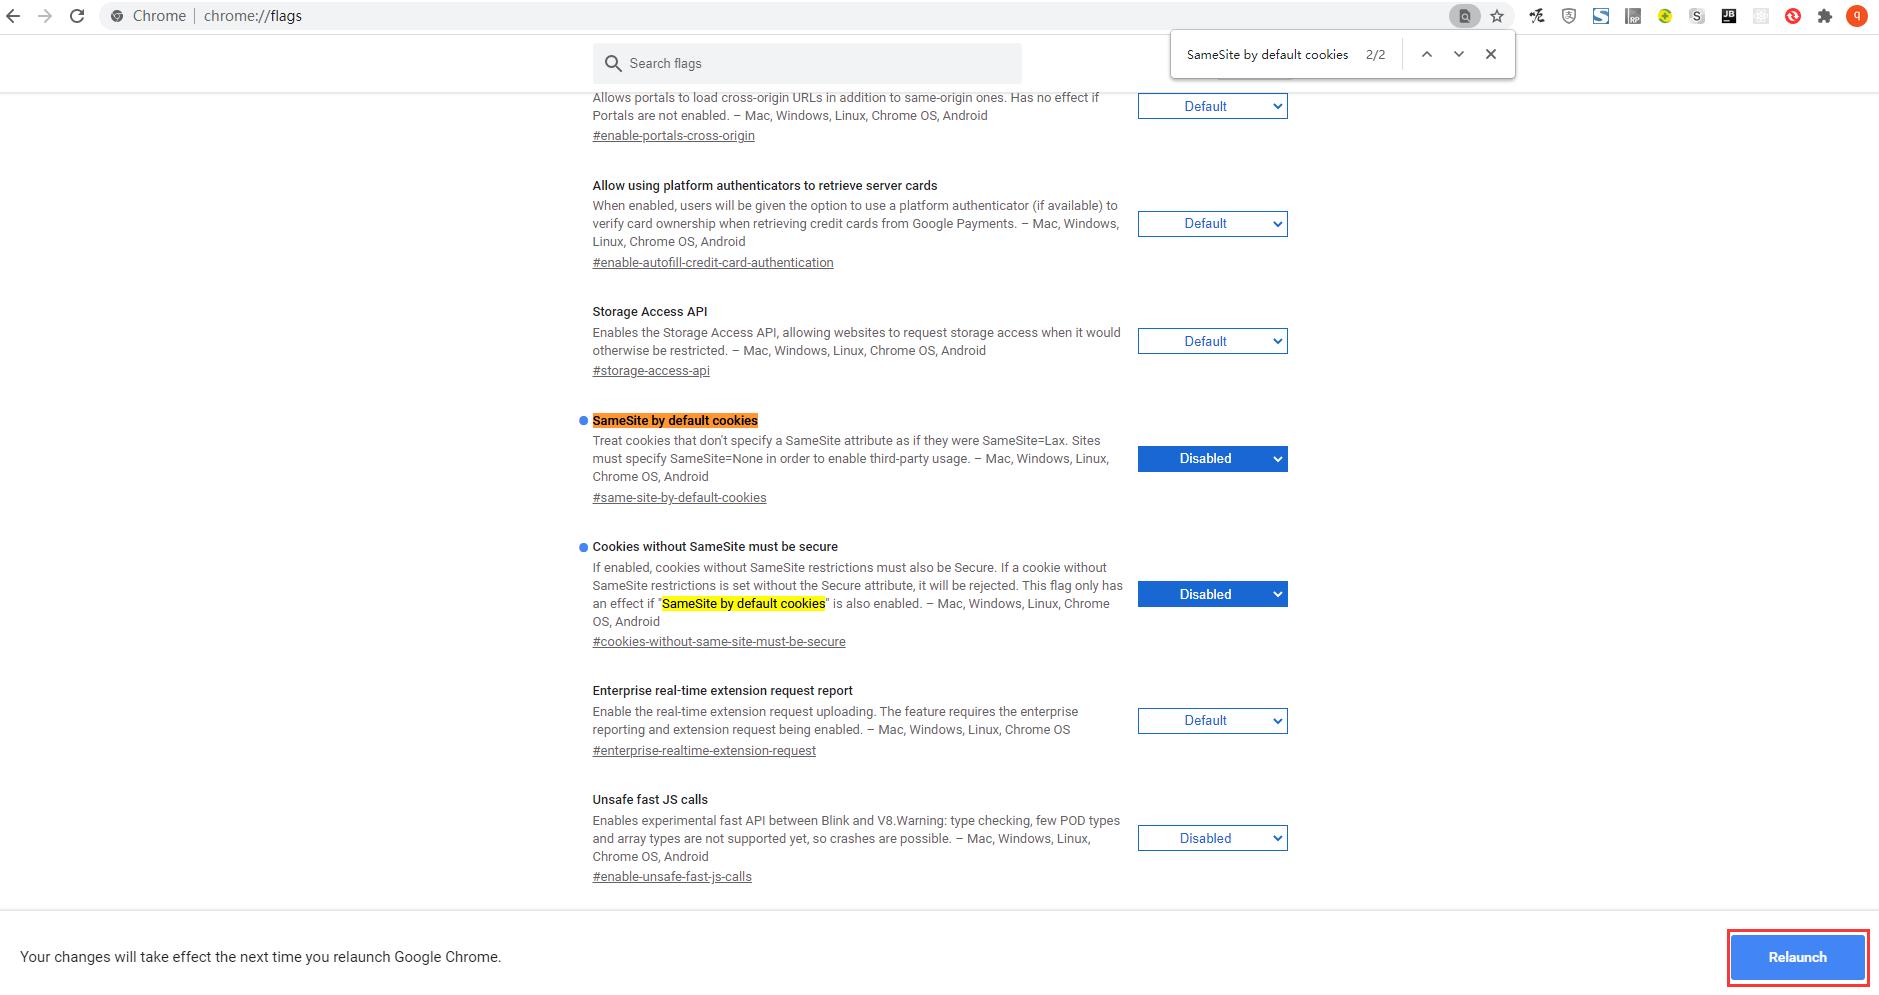 基于第三步,chrome://flags/,把这句复制到浏览器回车。SameSite by default cookies,其值:Default -> Disabled;Cookies without SameSite must be secure,其值:Default -> Disabled;Schemeful Same-Site,其值:Default -> Disabled。重启浏览器生效。